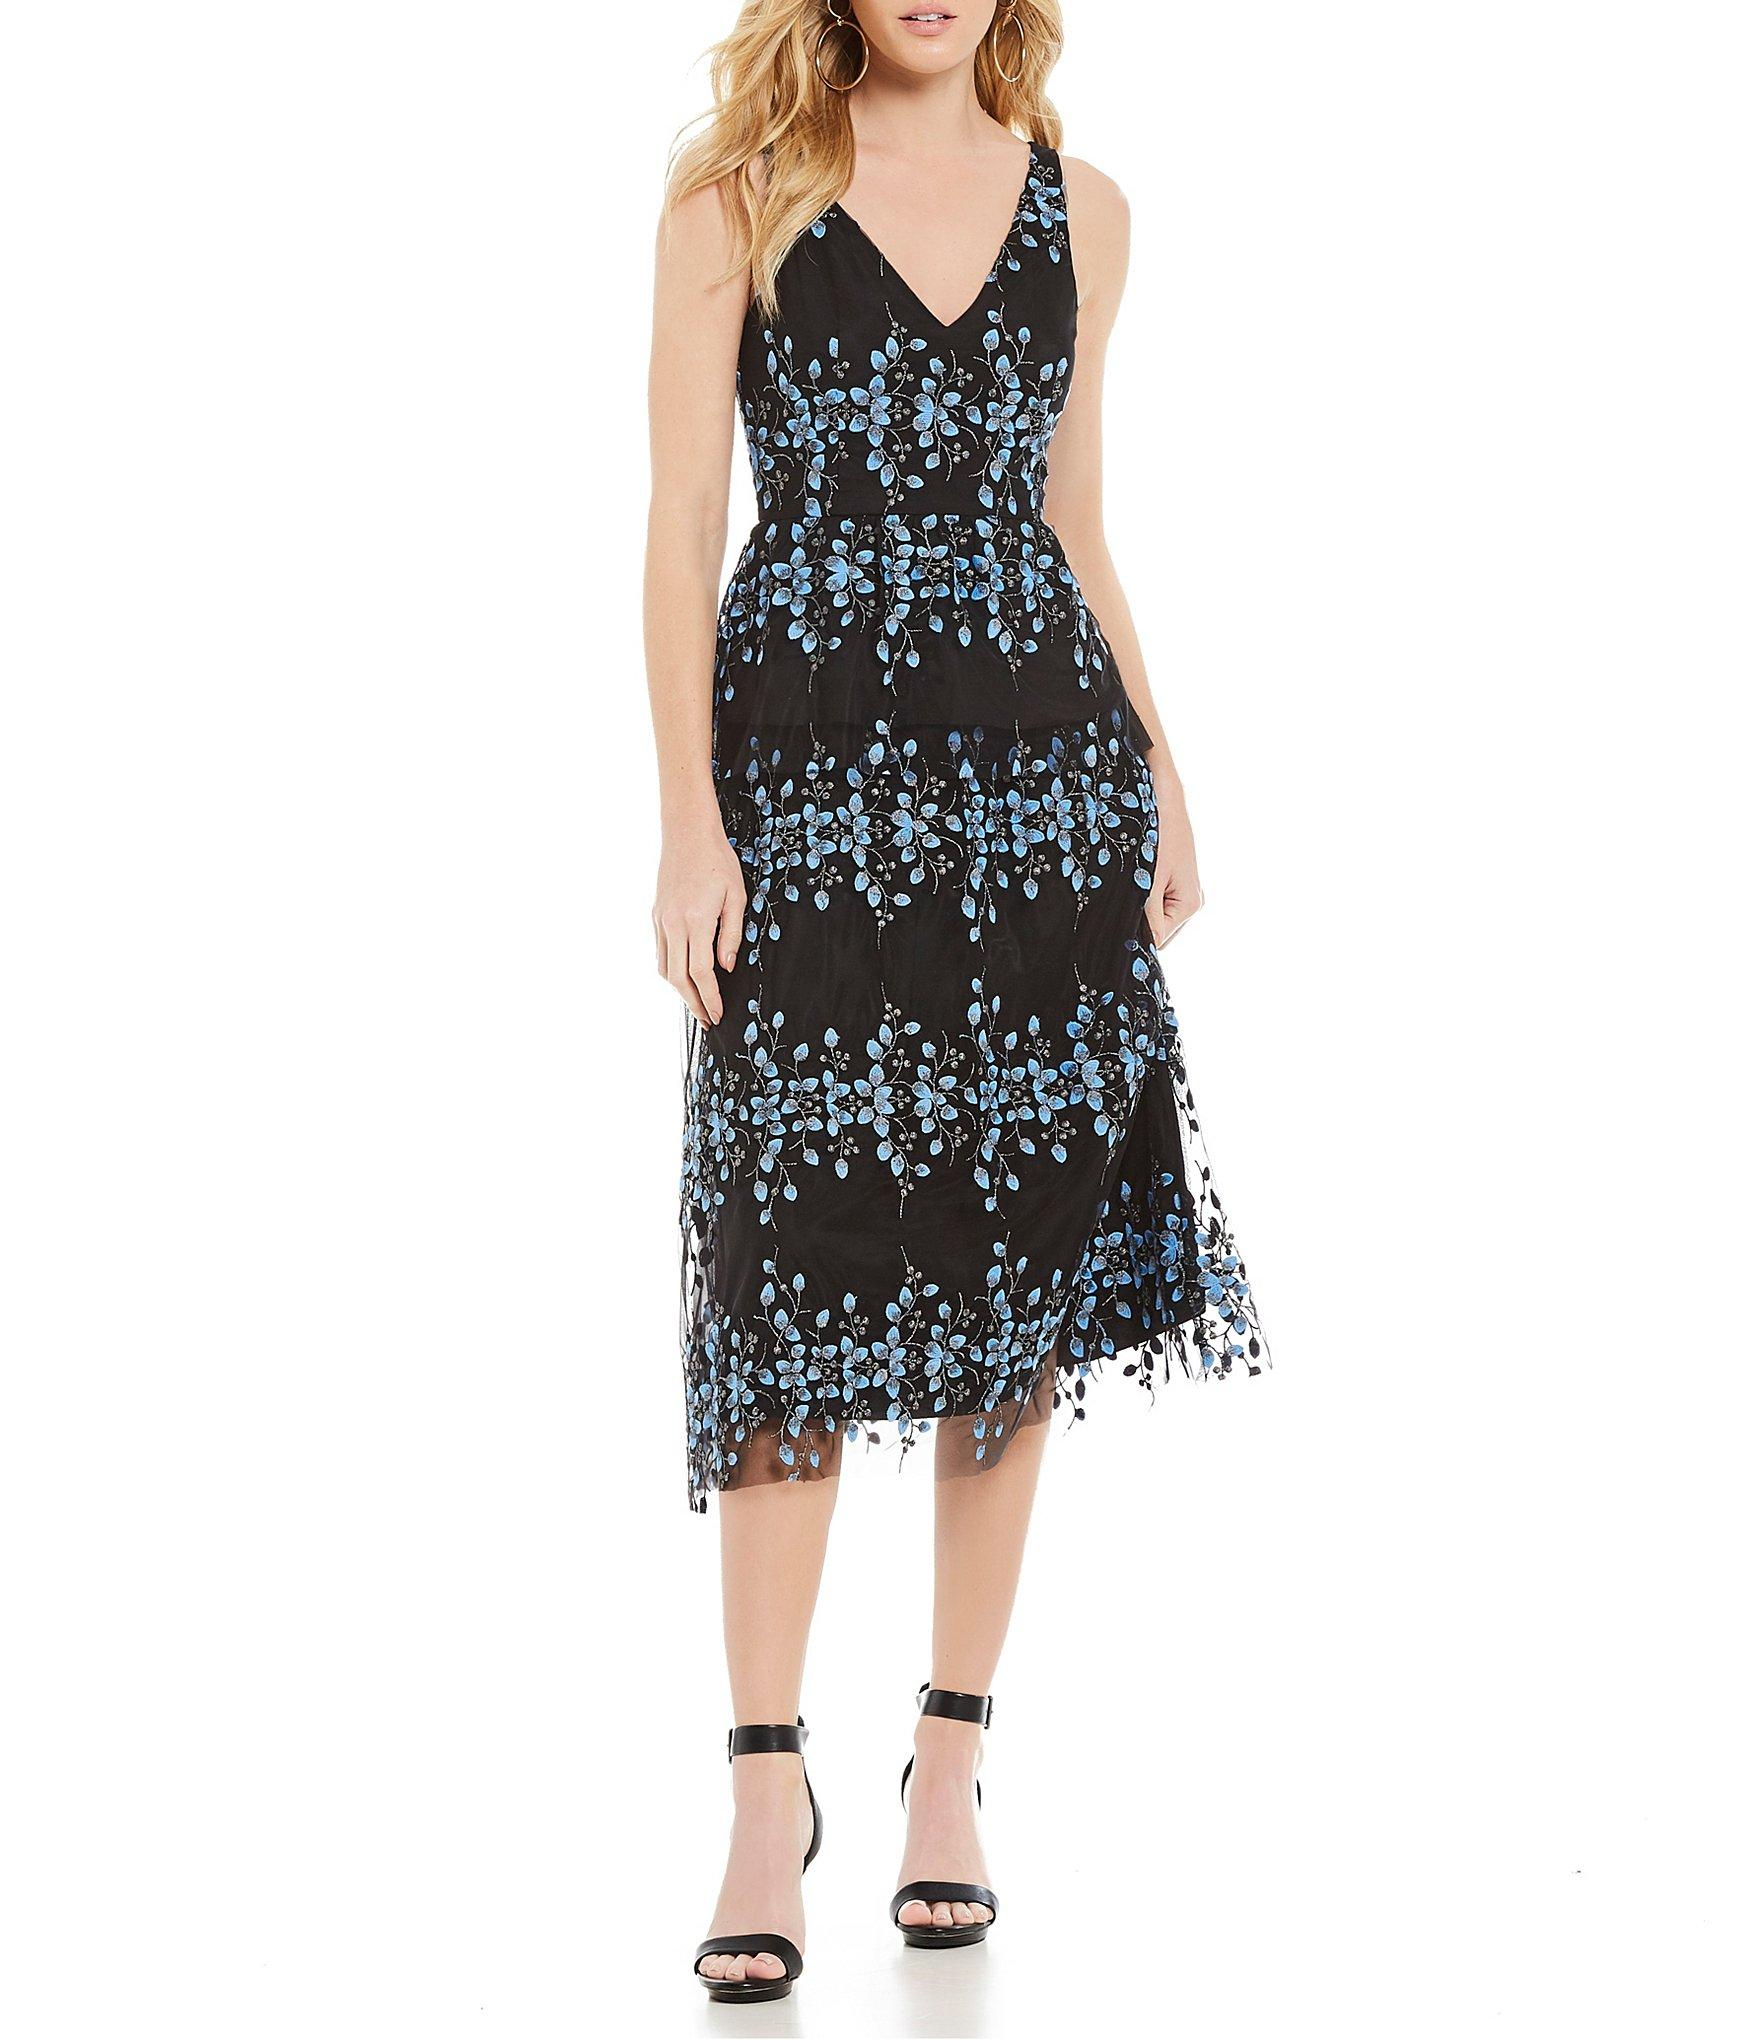 ea47de7b6e6 Gianni Bini - Black Emily Embroidered Midi Dress - Lyst. View fullscreen